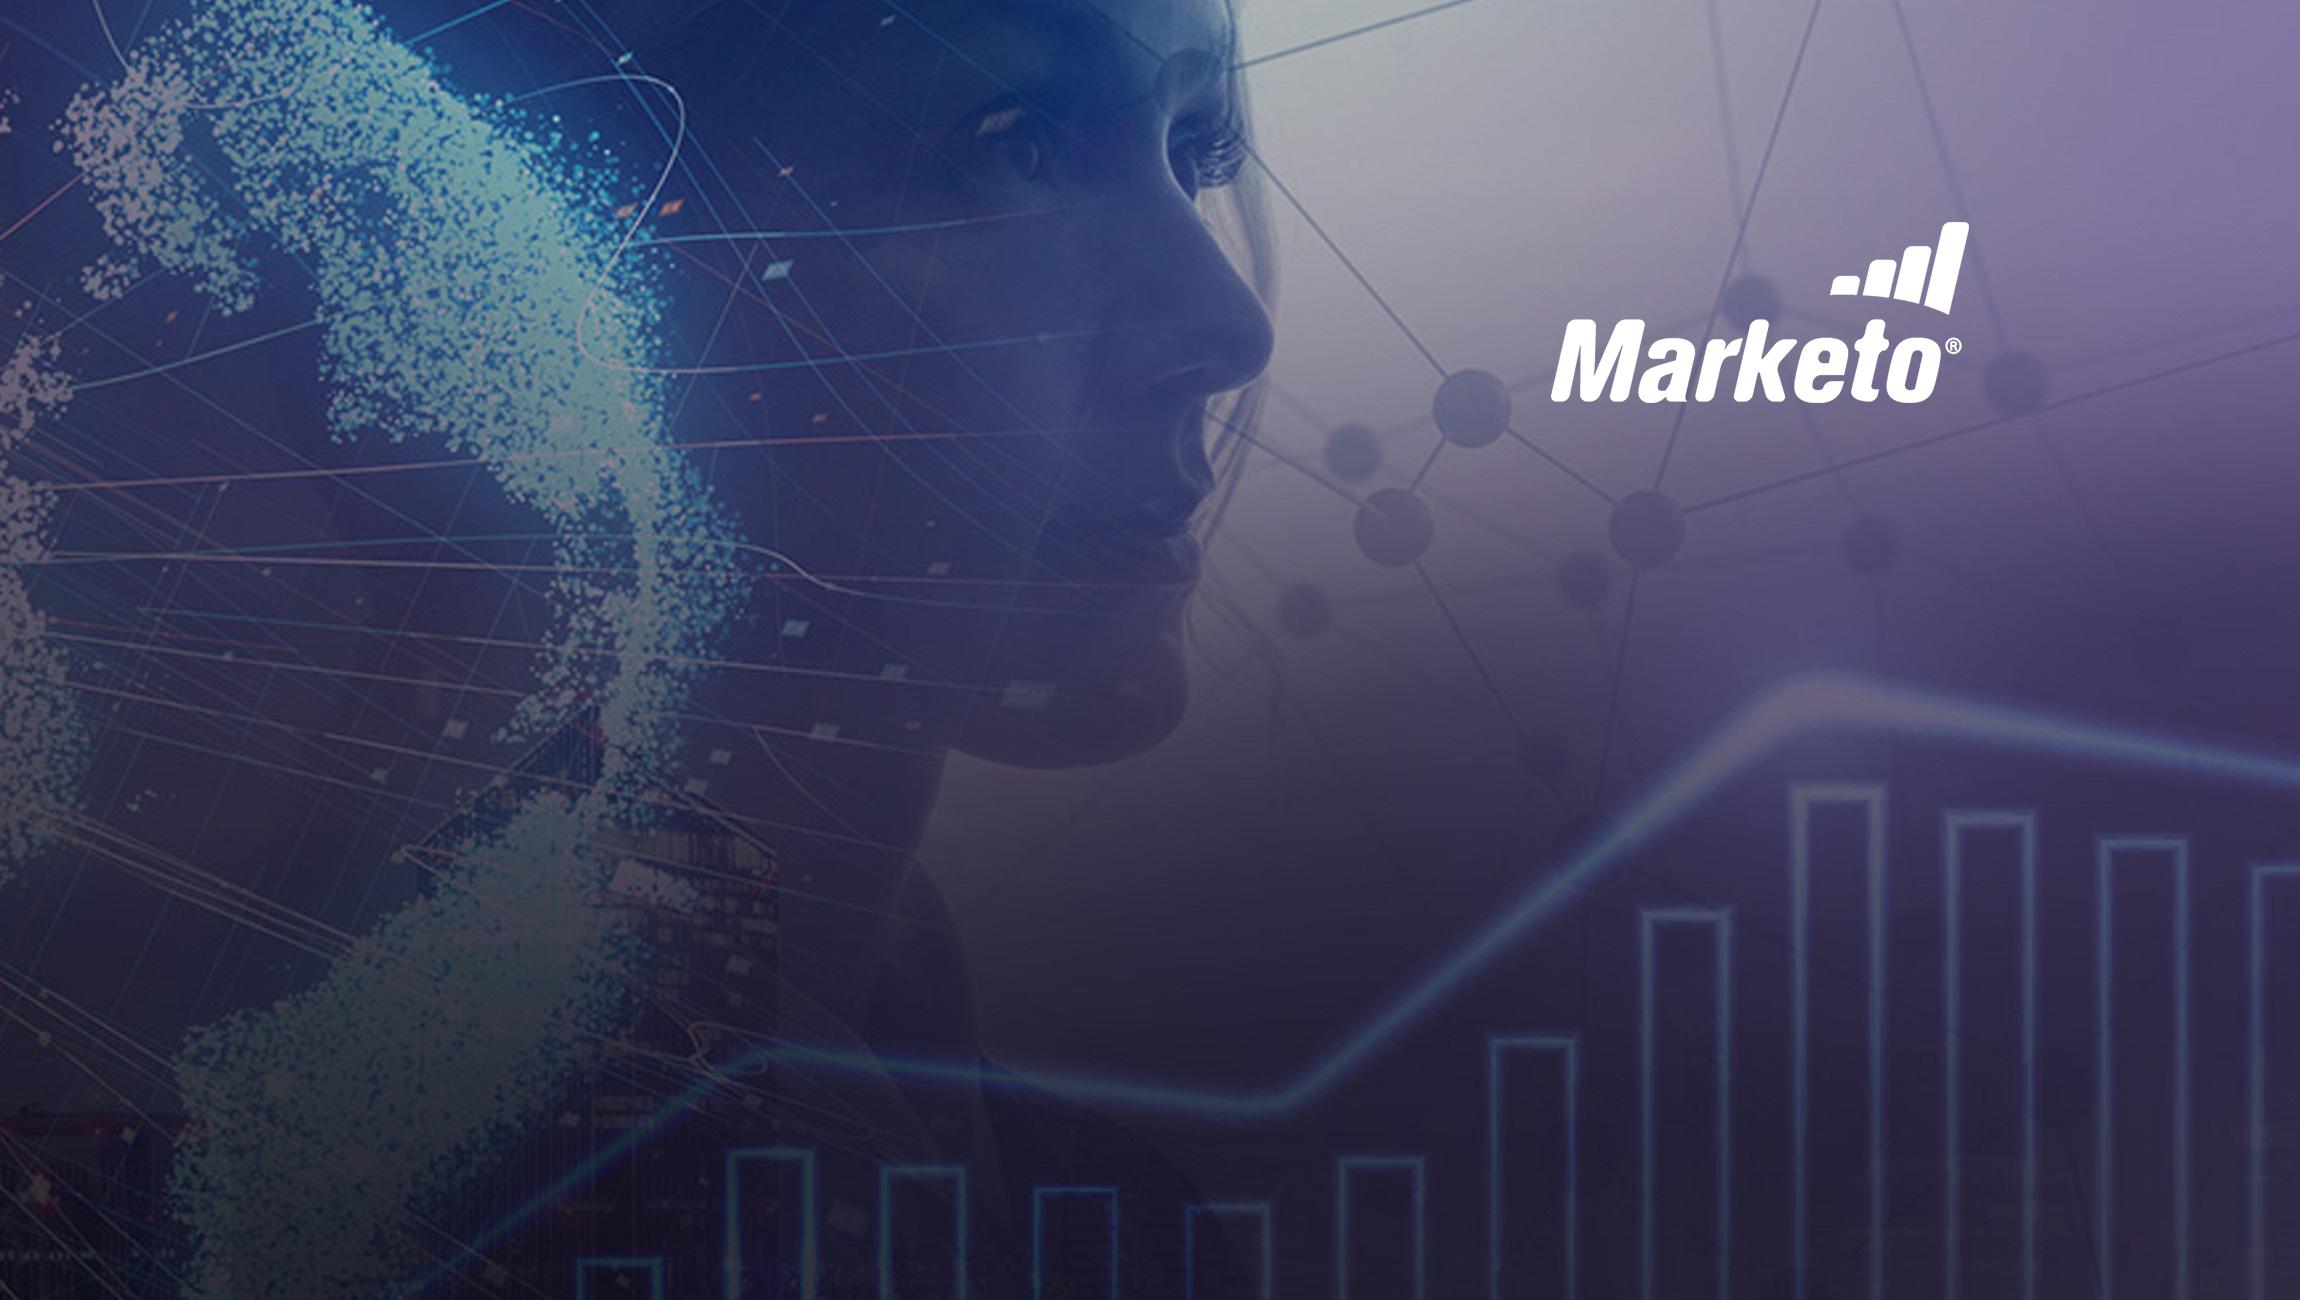 Adobe 以 47.5 亿美元收购营销自动化公司 Marketo